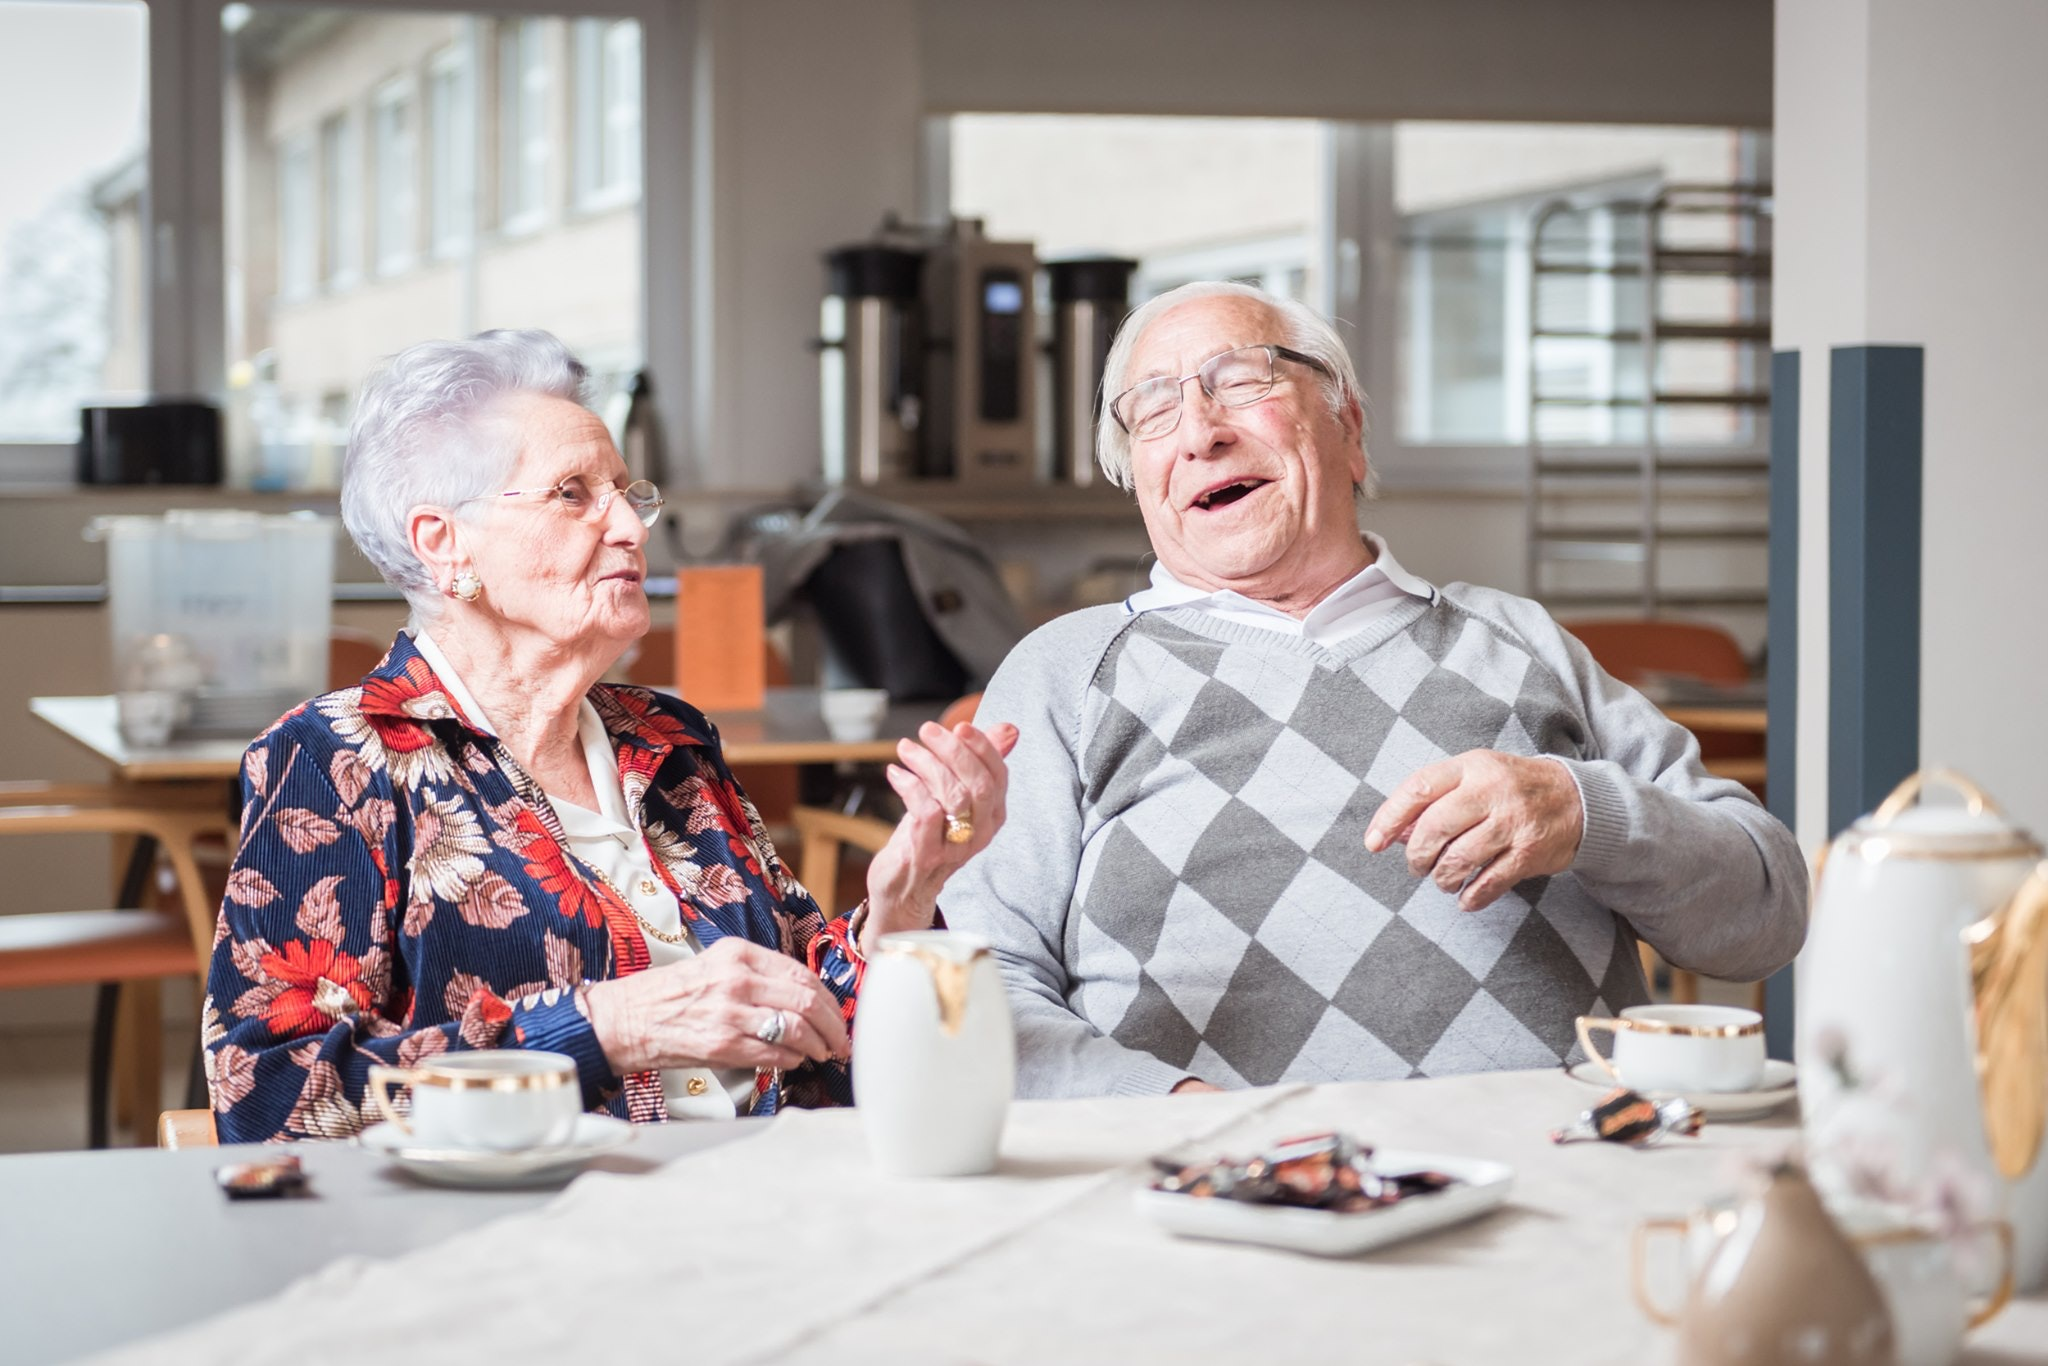 Motena hero image, two elderly people enjoying care in nursery home